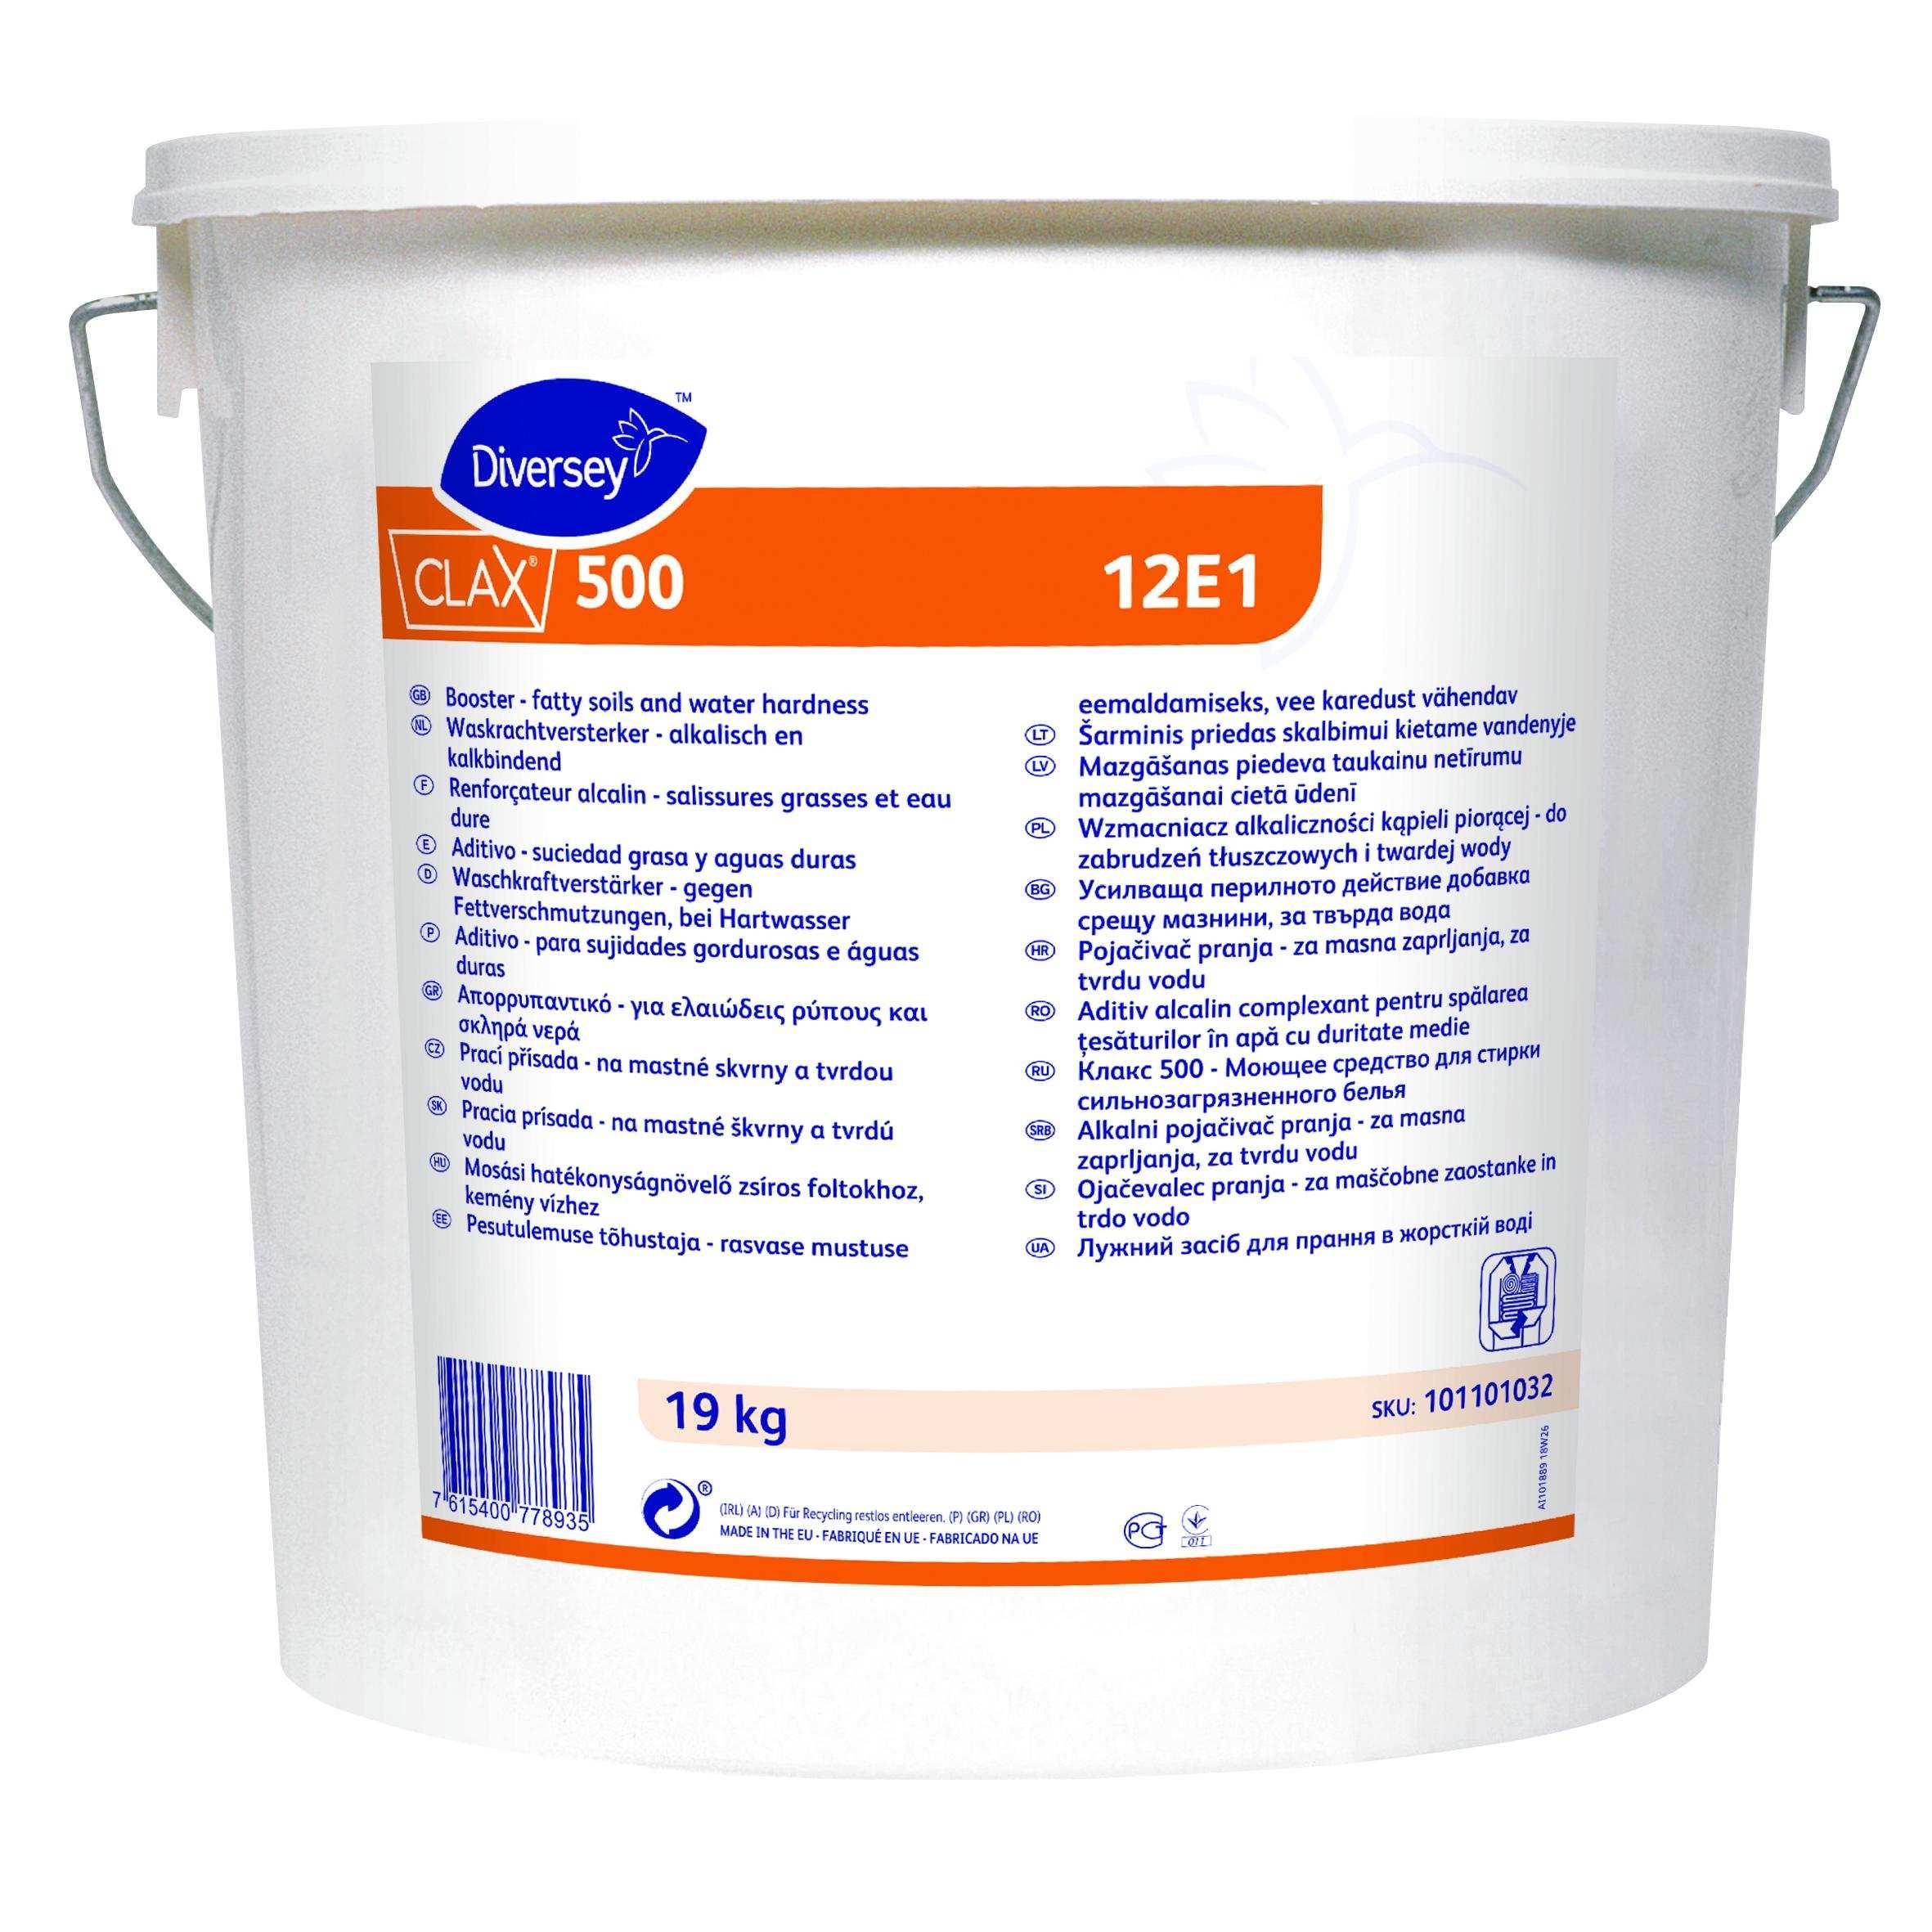 101101032-Clax-500-12E1-19Kg-CMYK-20x20cm.jpg